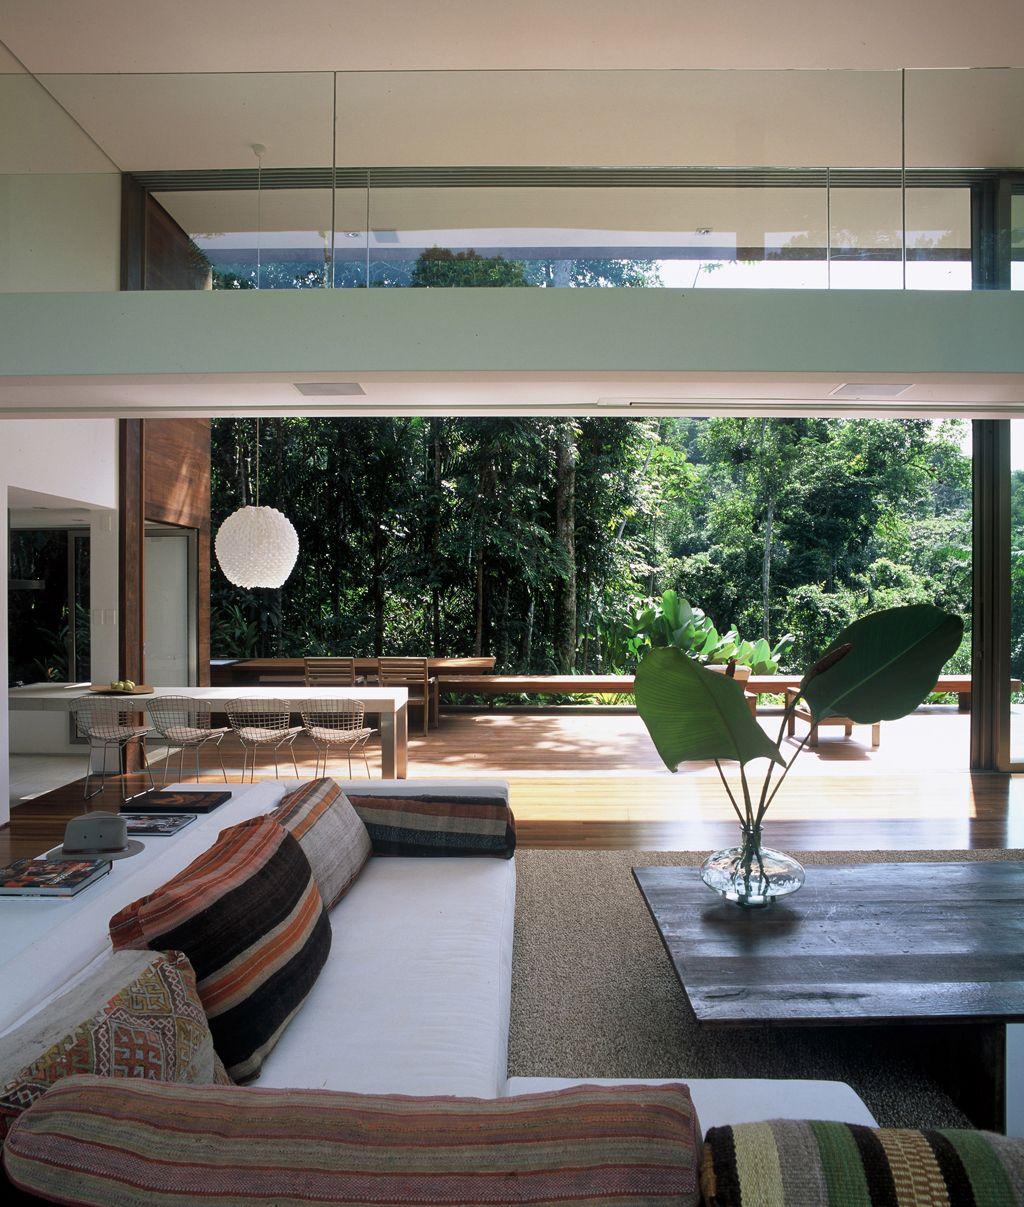 AC Iporanga / Studio Arthur Casas #living #dining #patio #yard #green #view